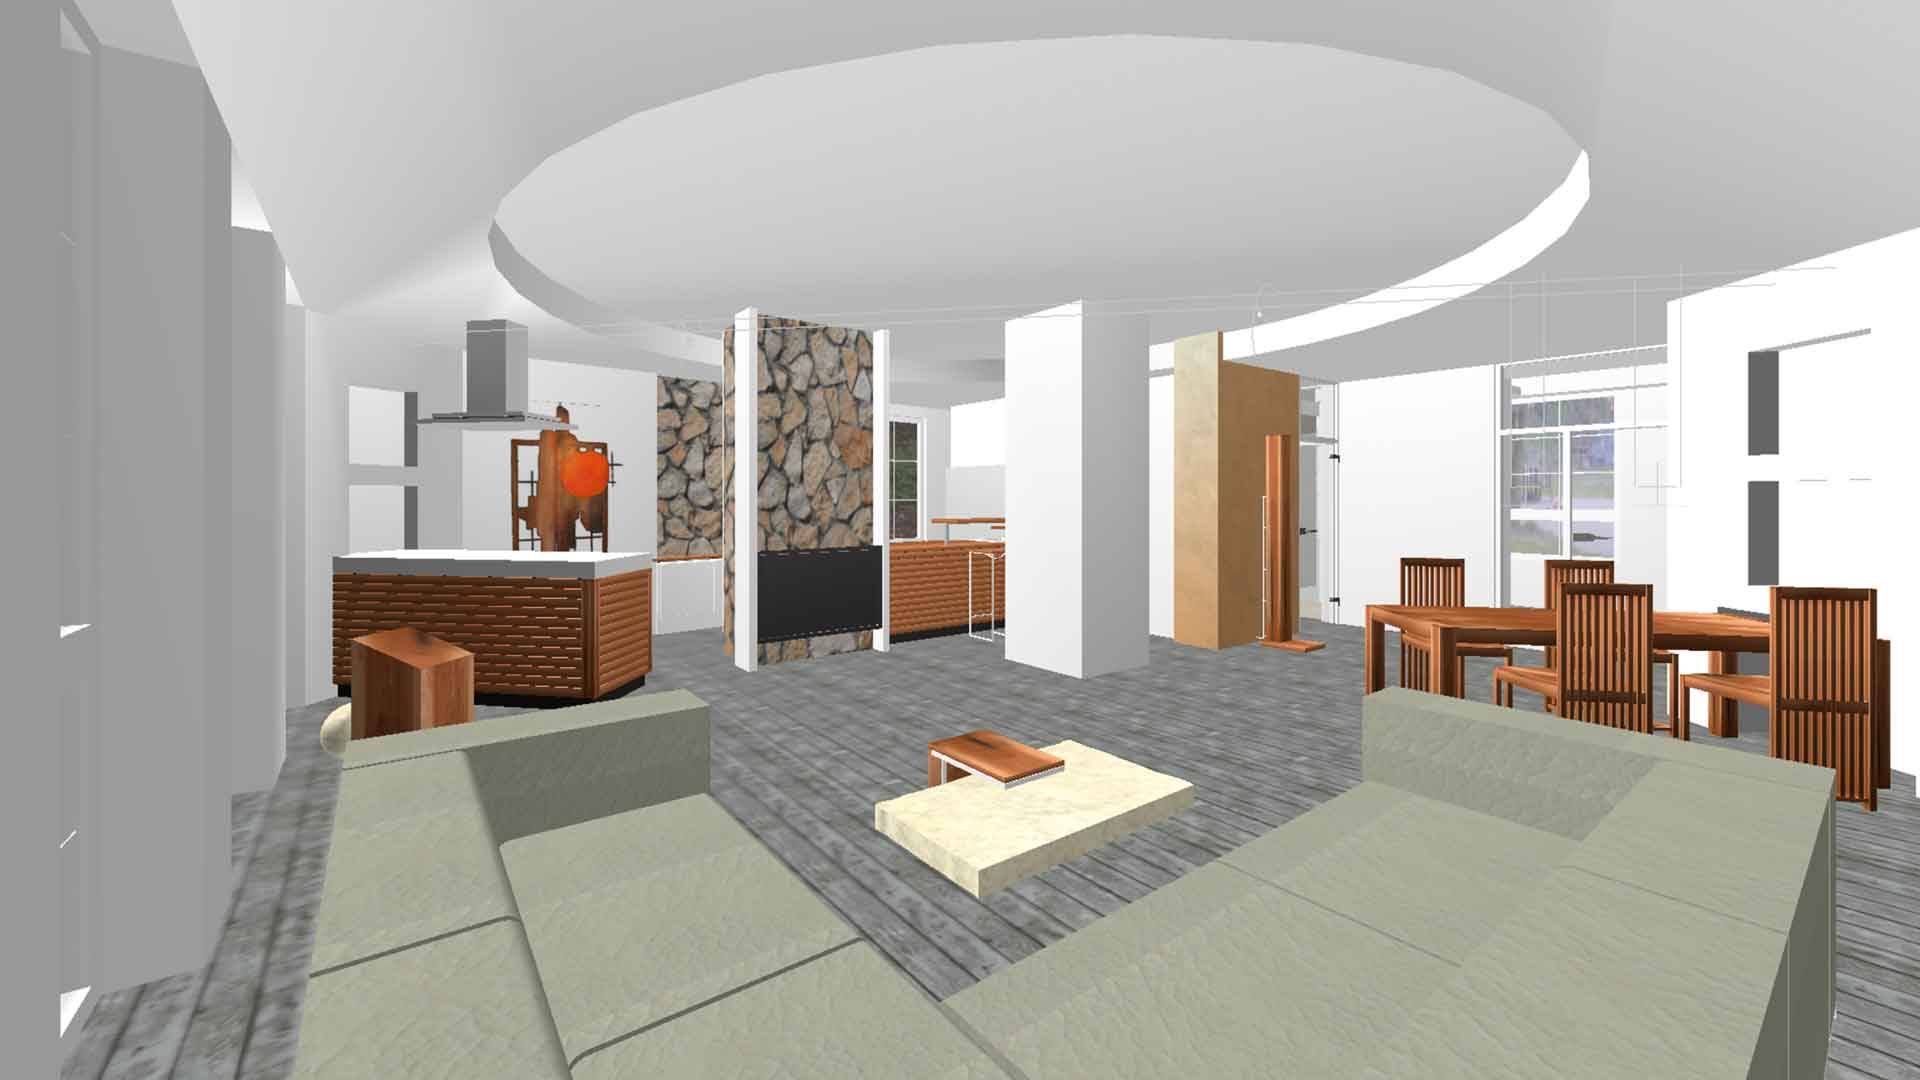 Wohnung_5_Visualisierung_Modifica